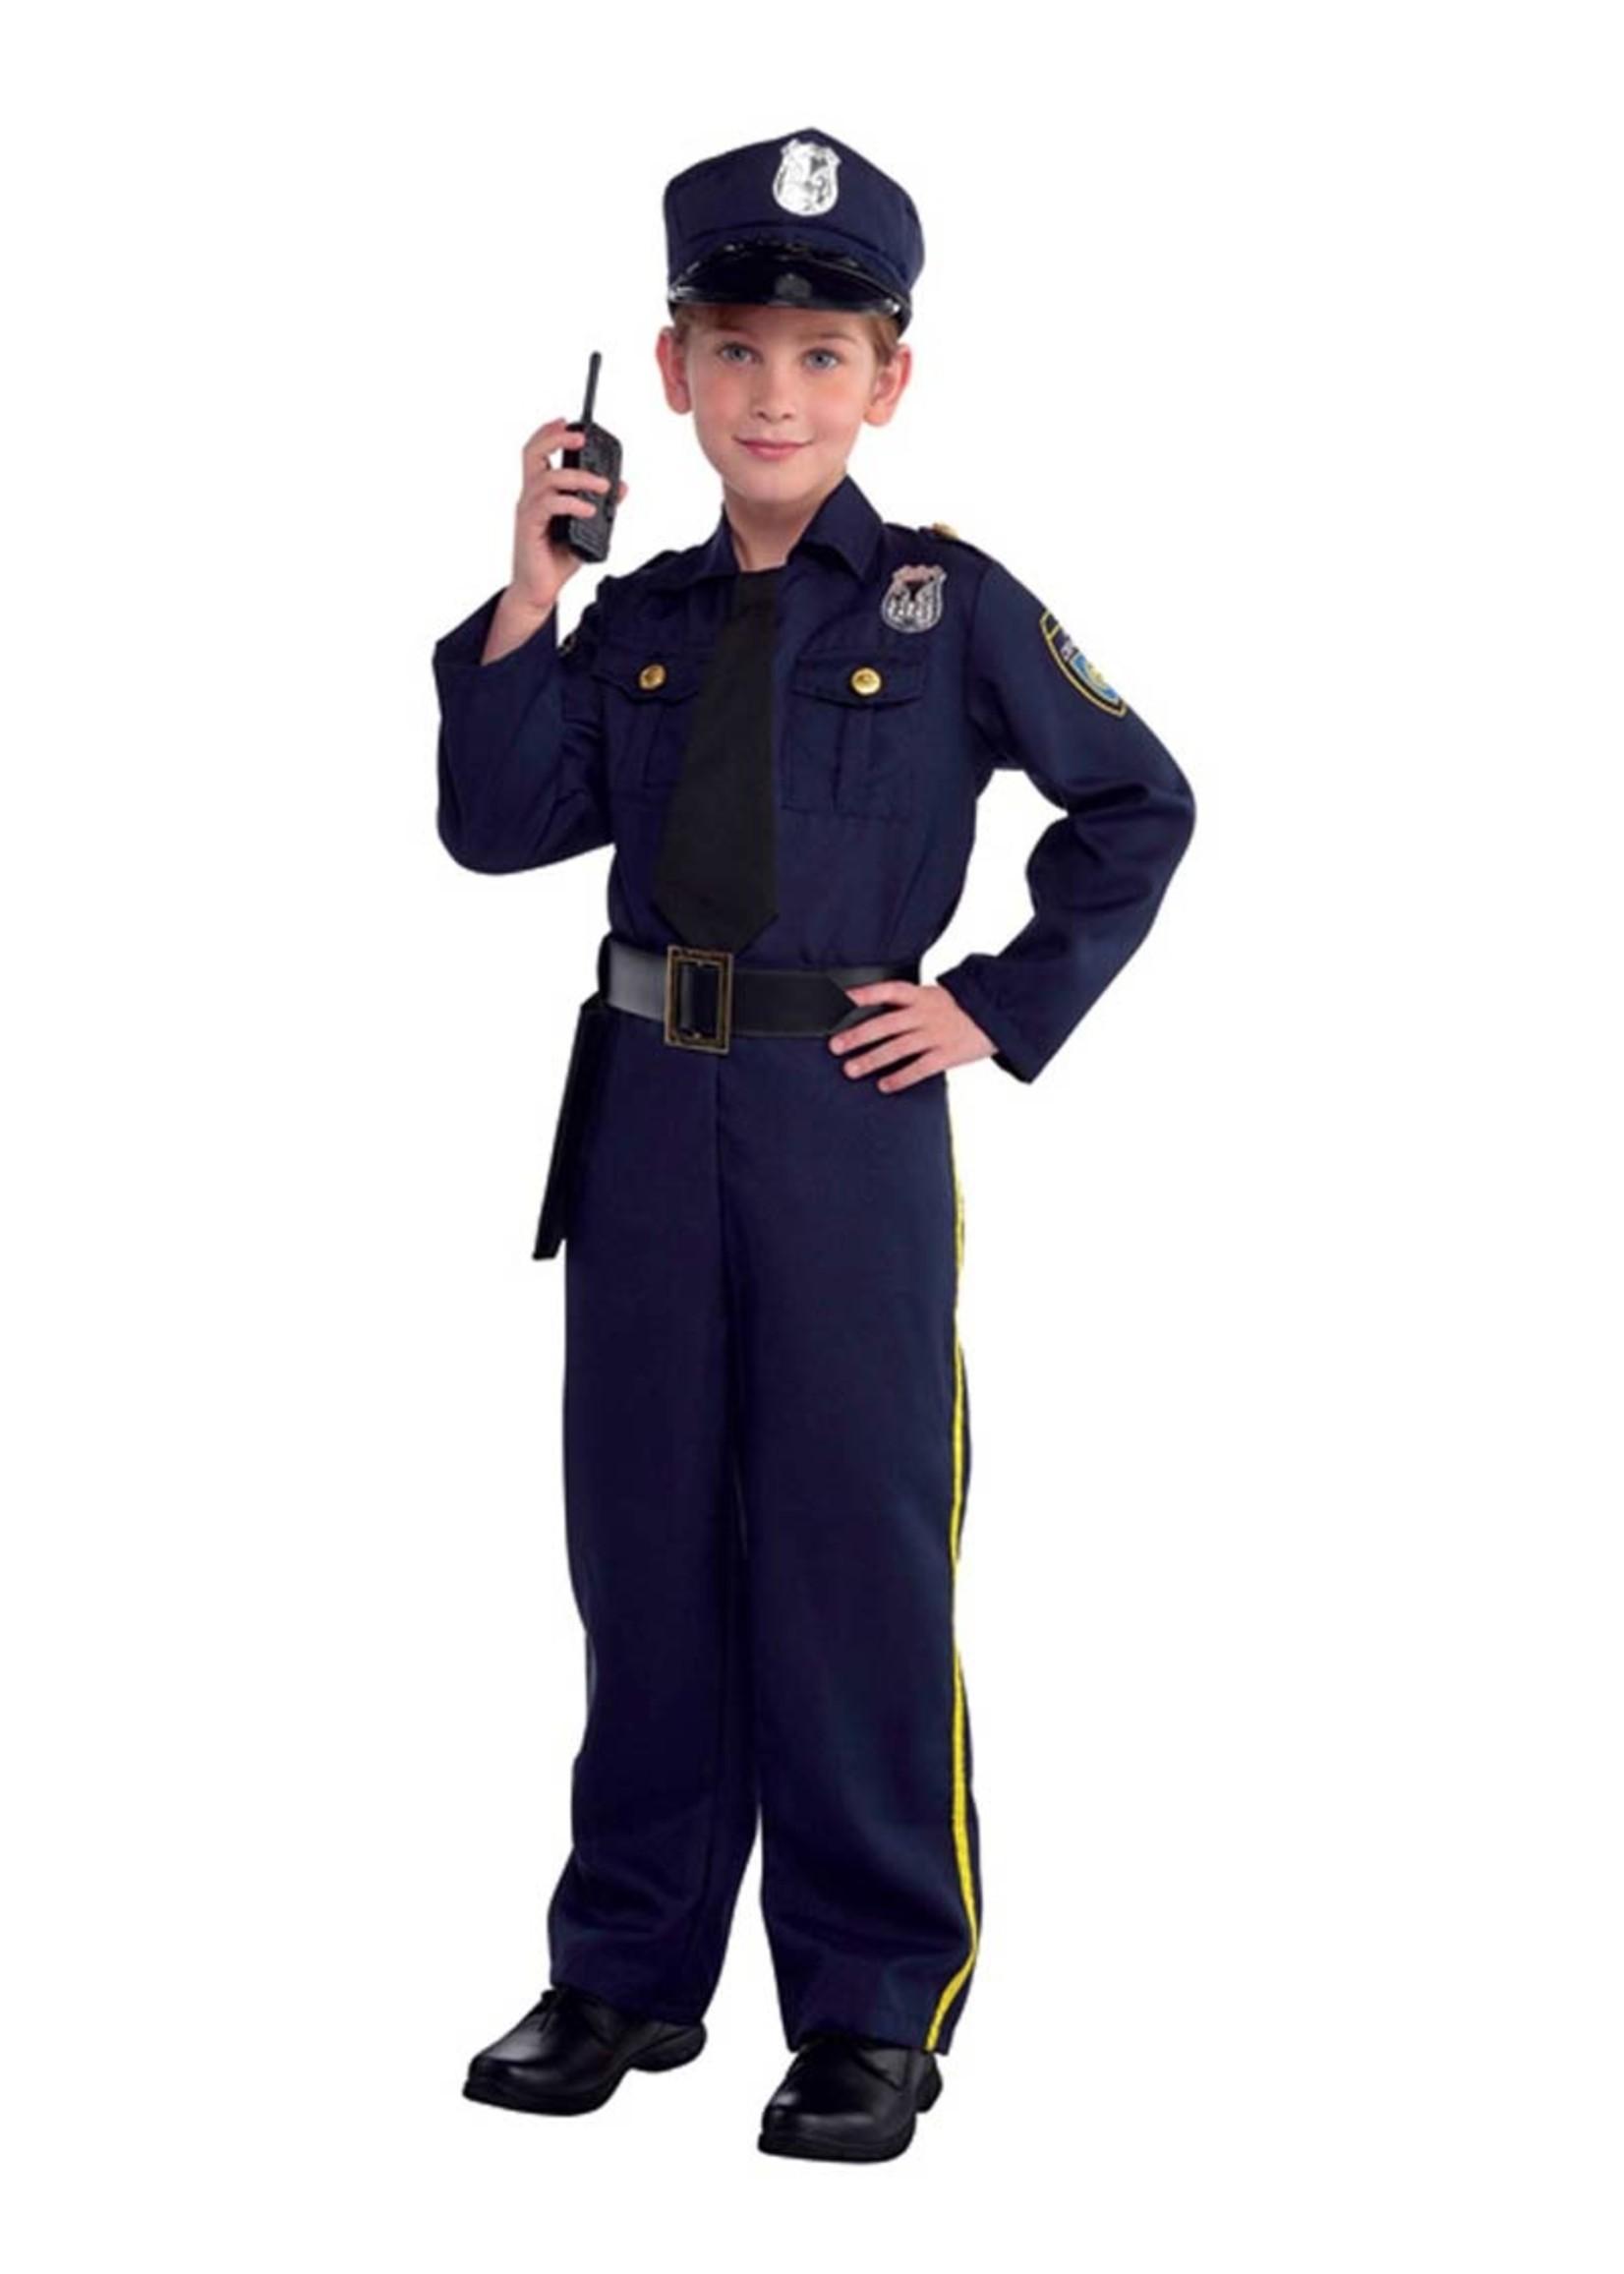 Police Officer - Boys